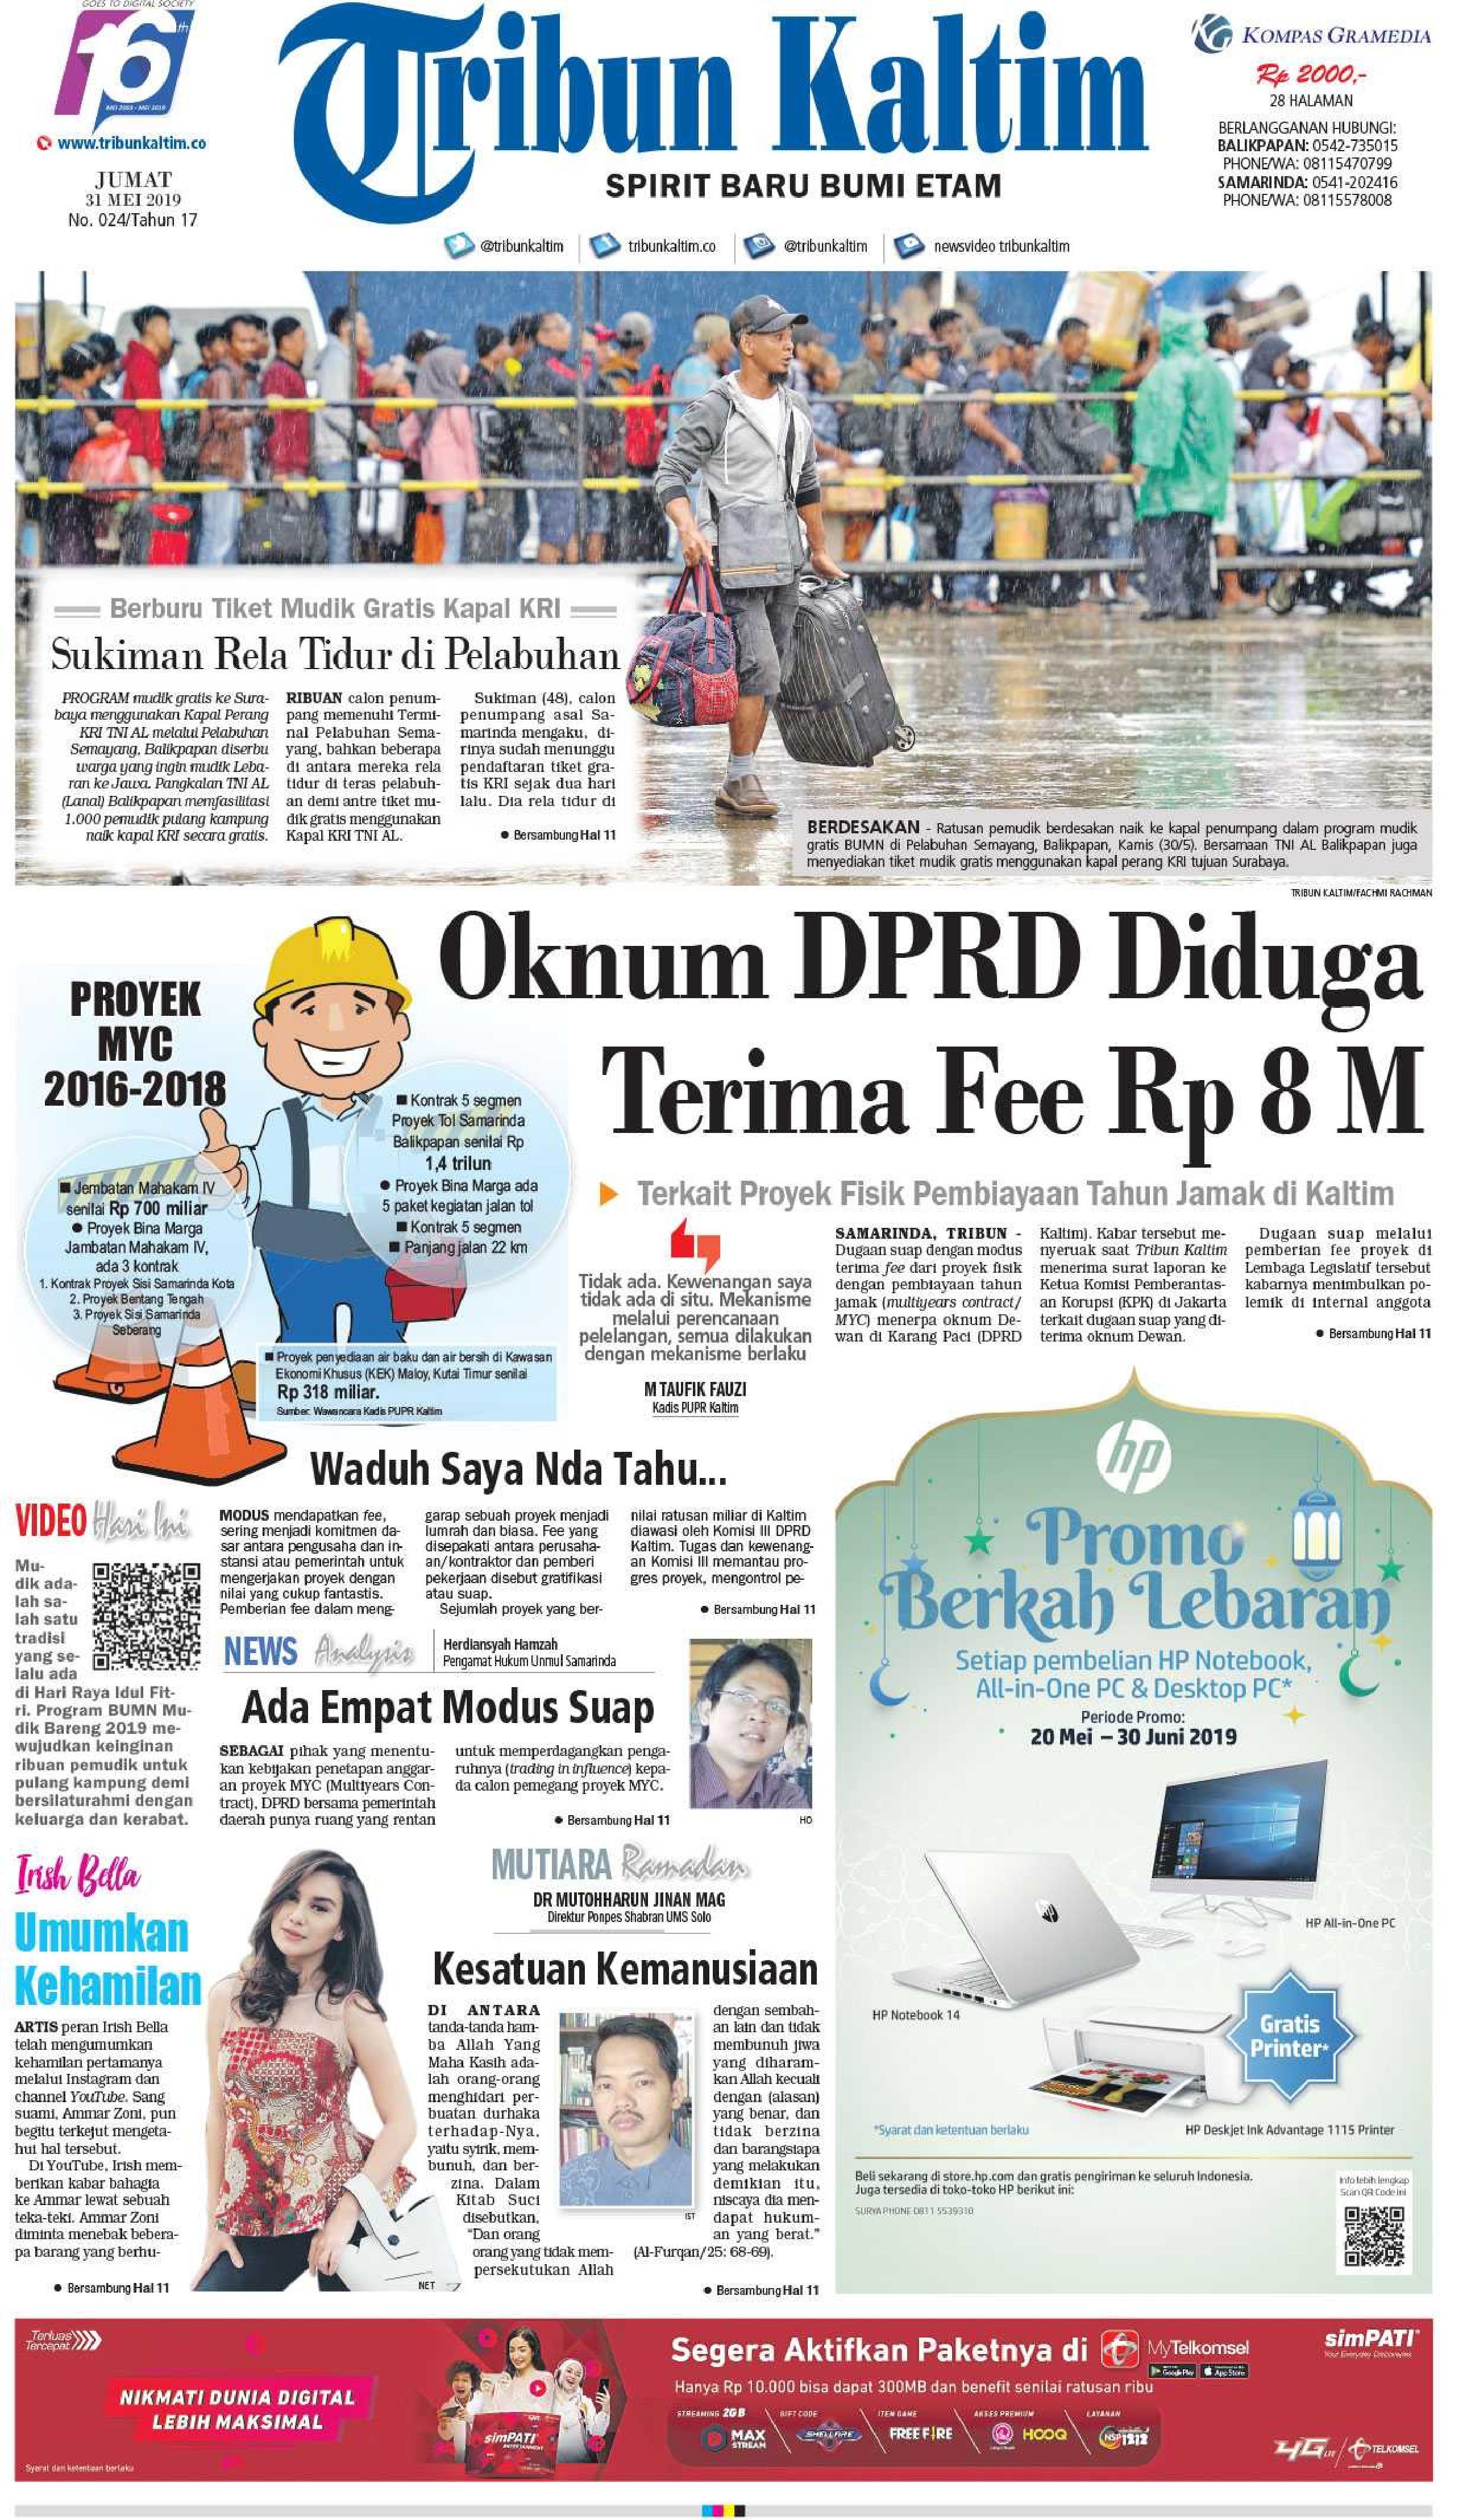 Tribun Kaltim Newspaper 31 May 2019 - Gramedia Digital